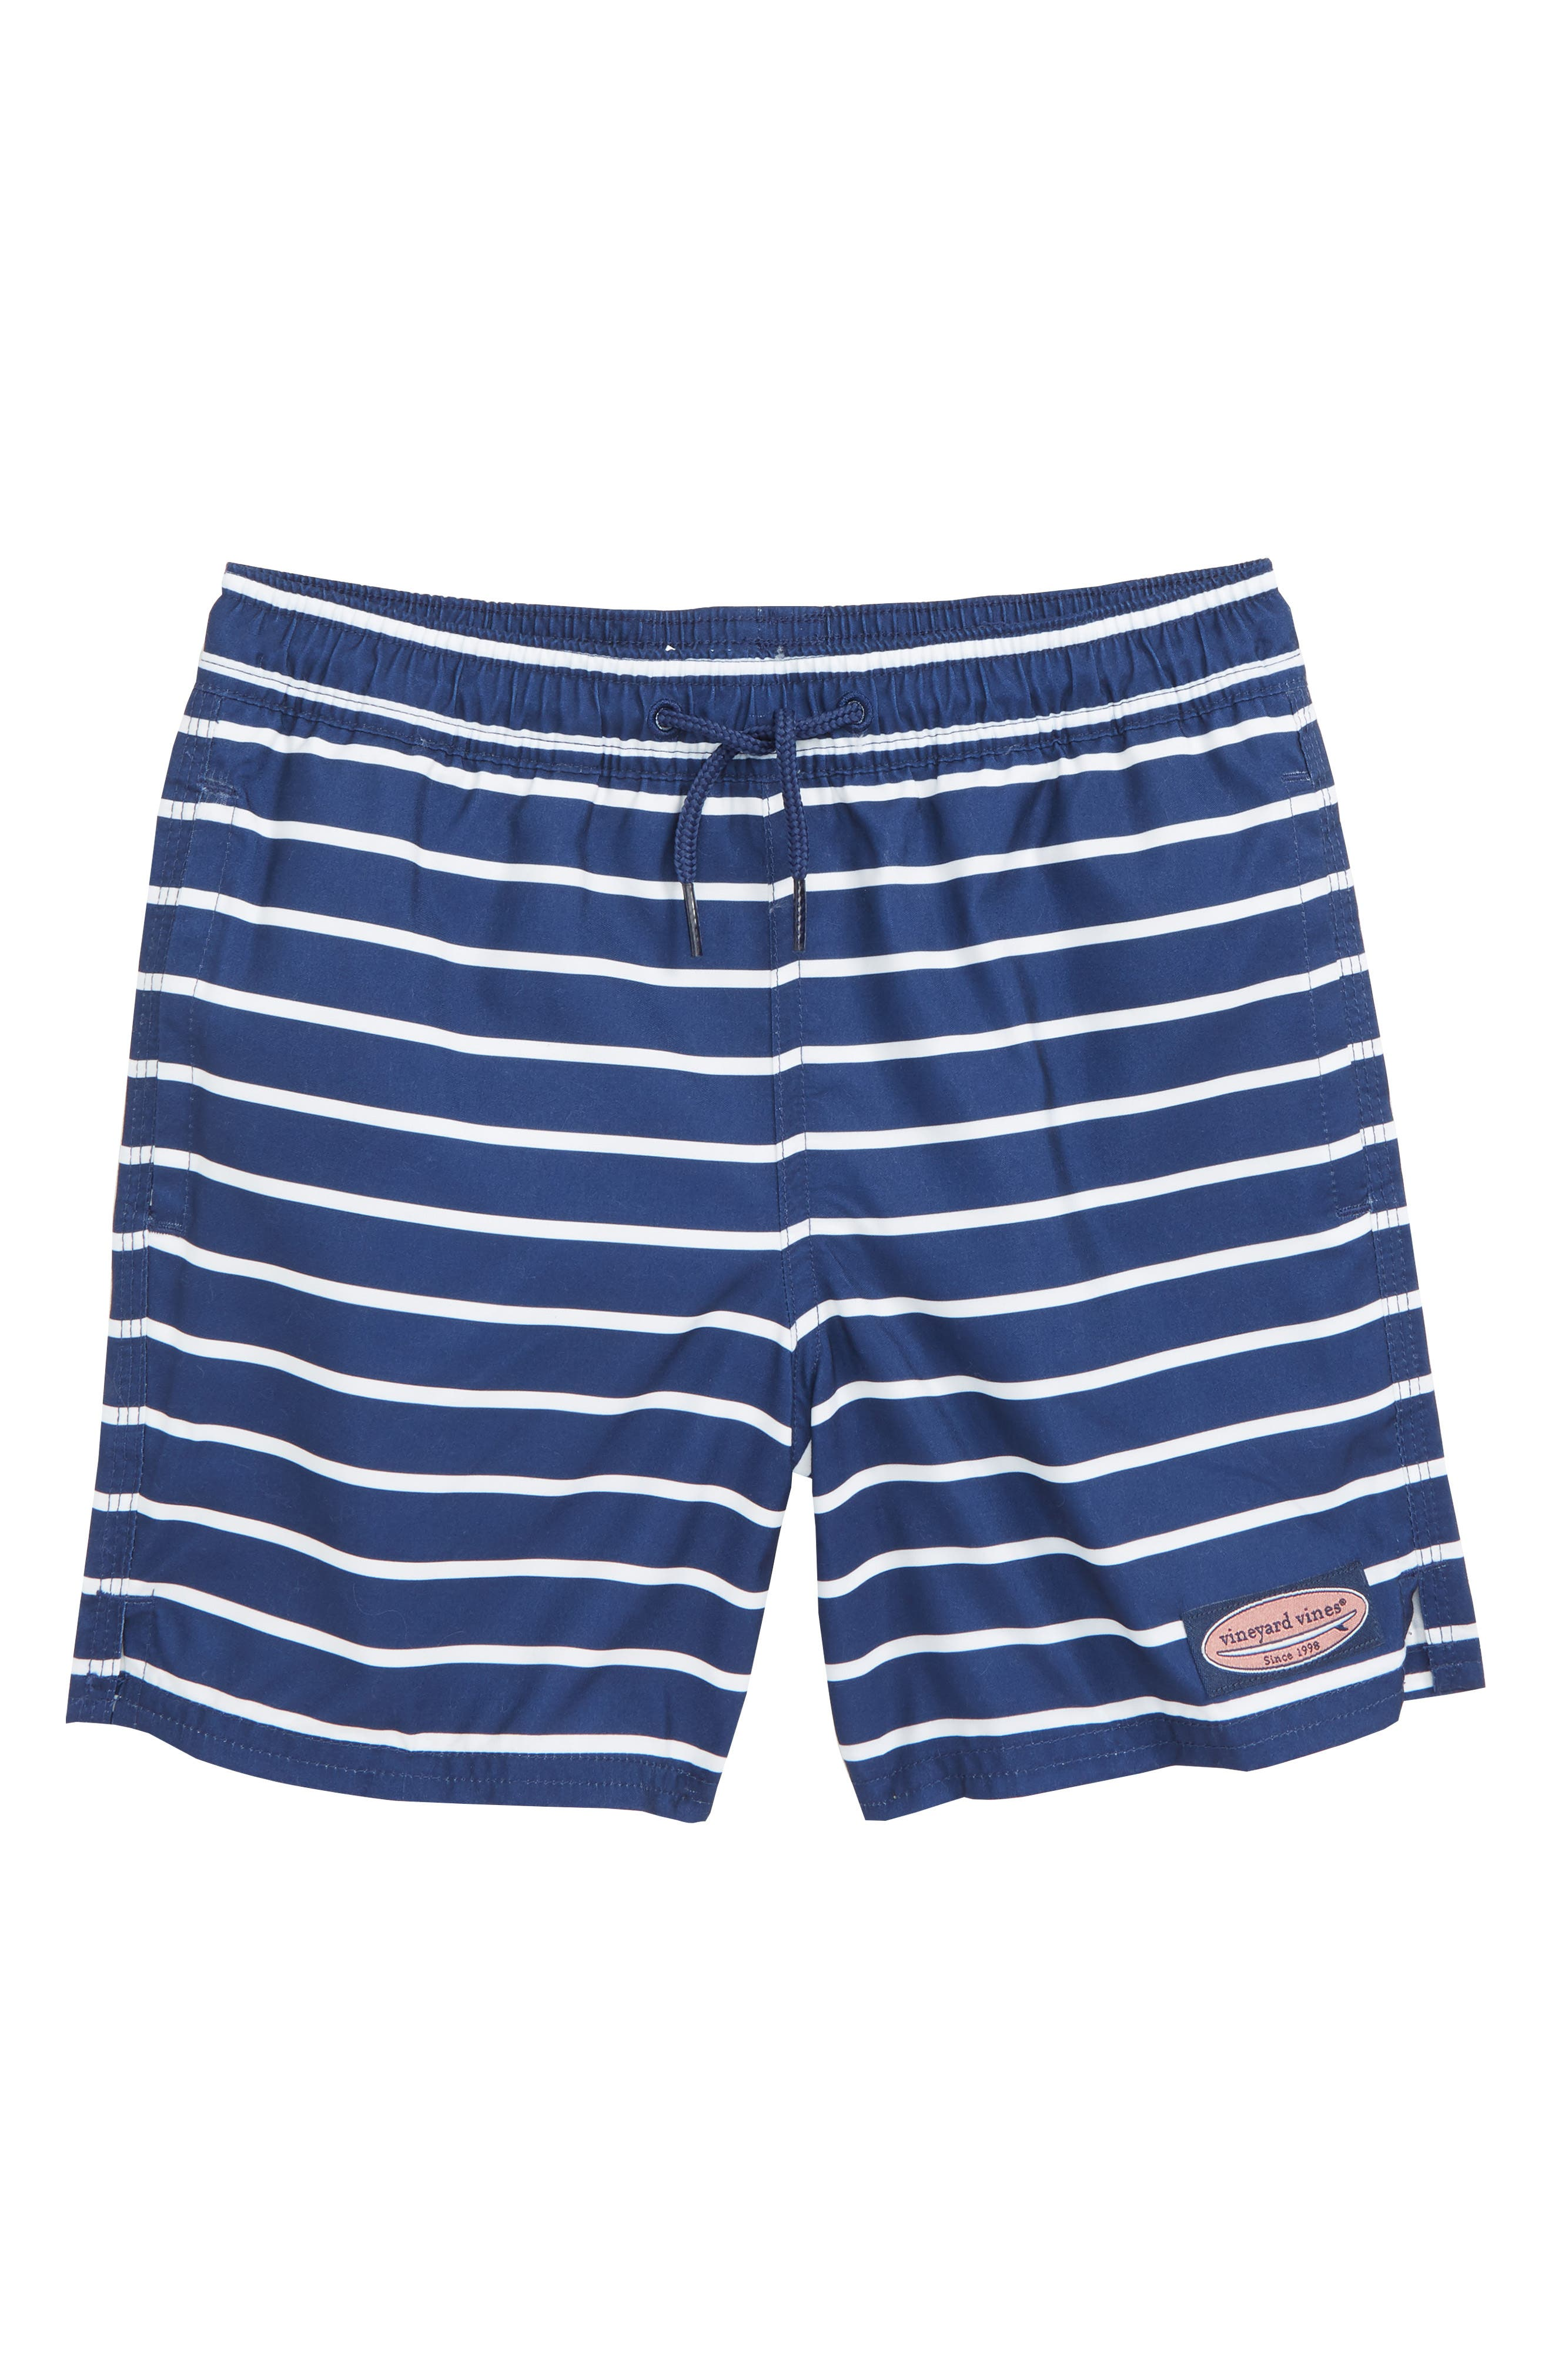 Break Stripe Chappy Swim Trunks,                             Main thumbnail 1, color,                             DEEP BAY